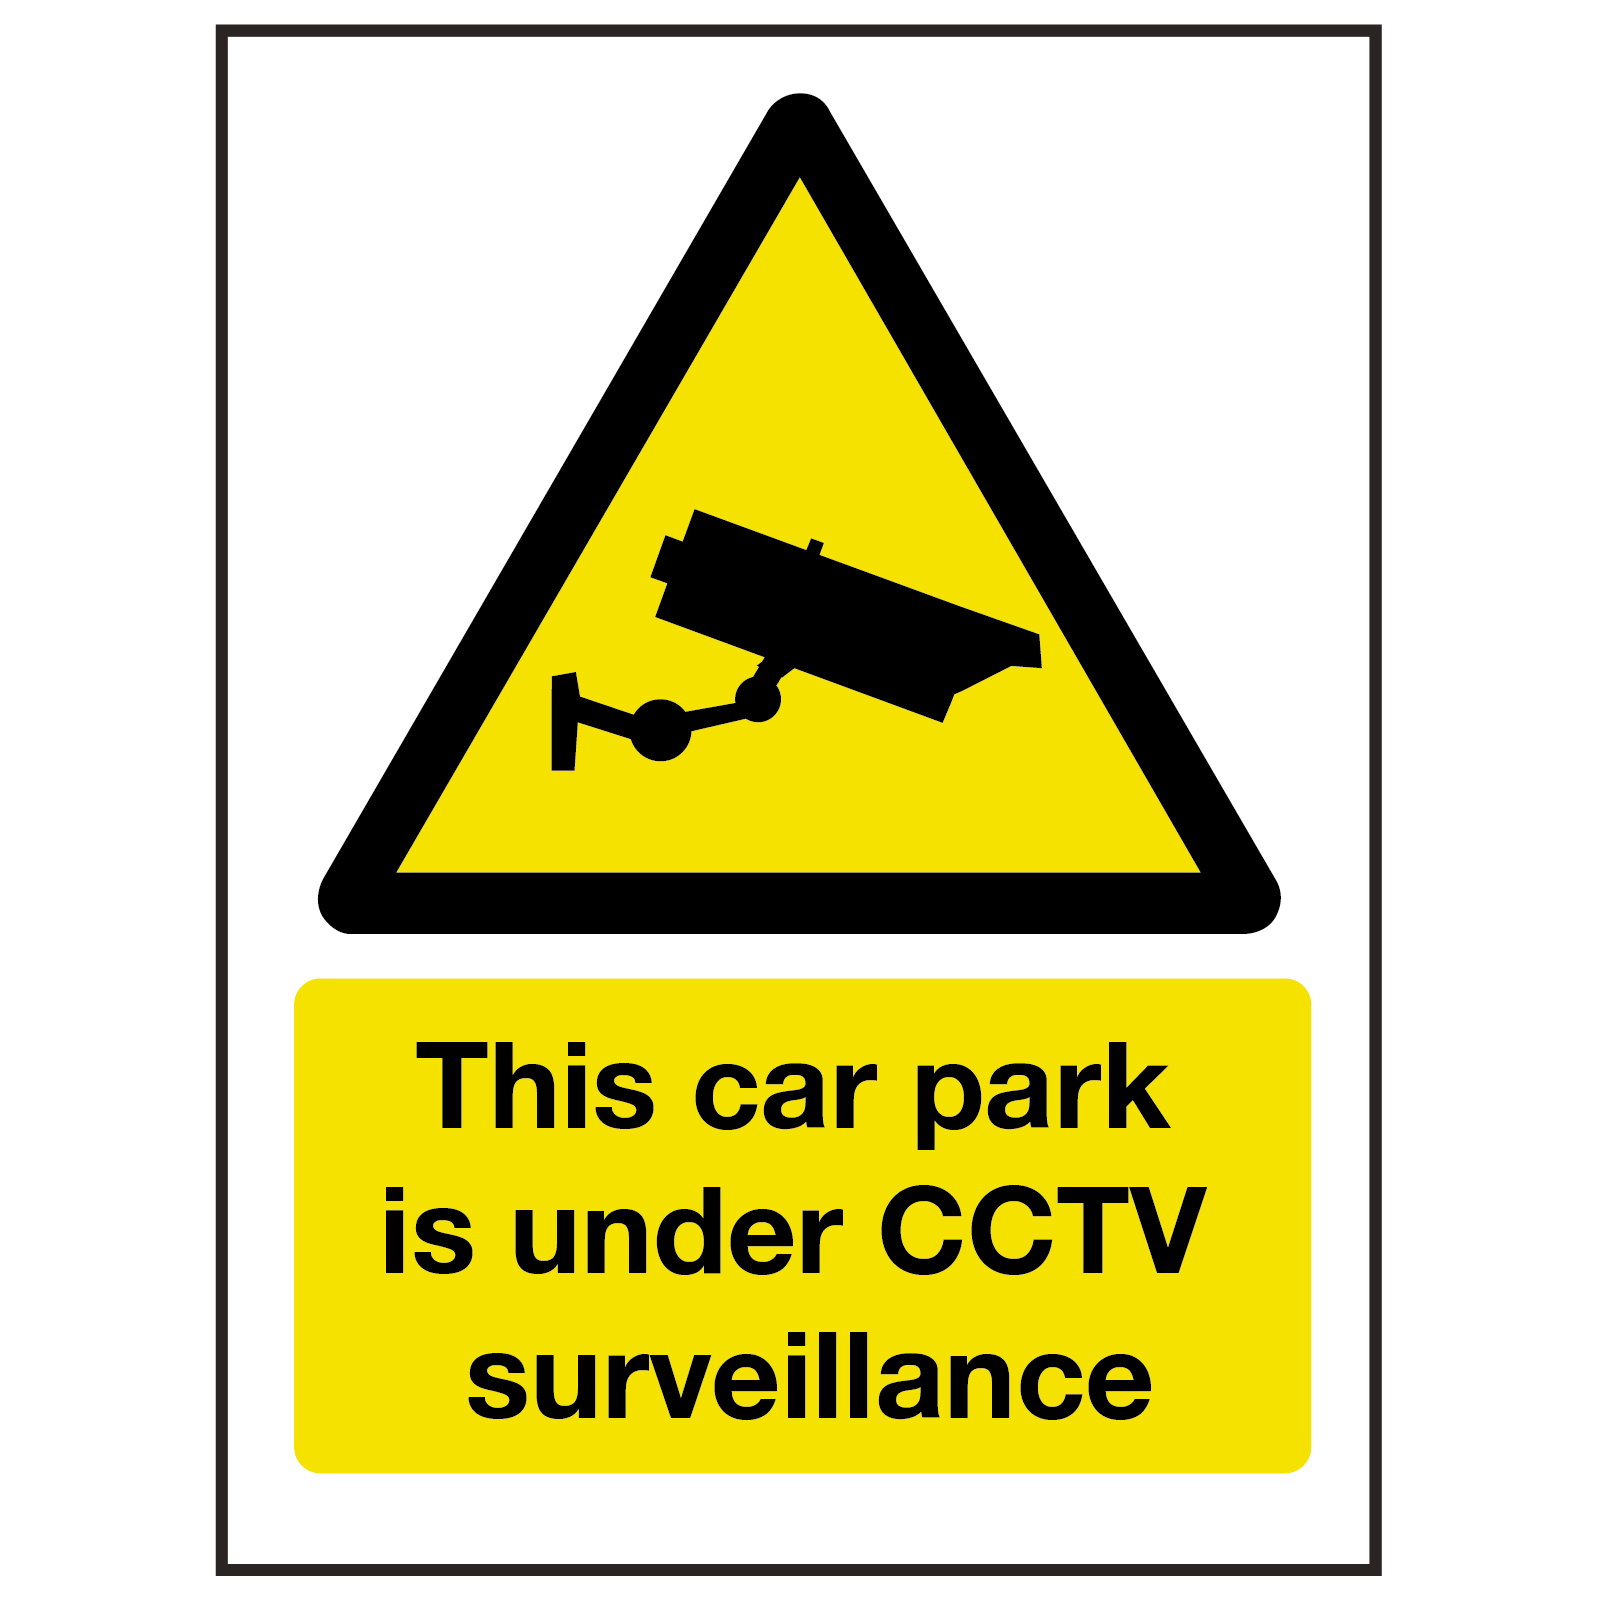 Car Park Under CCTV Surveillance Sign